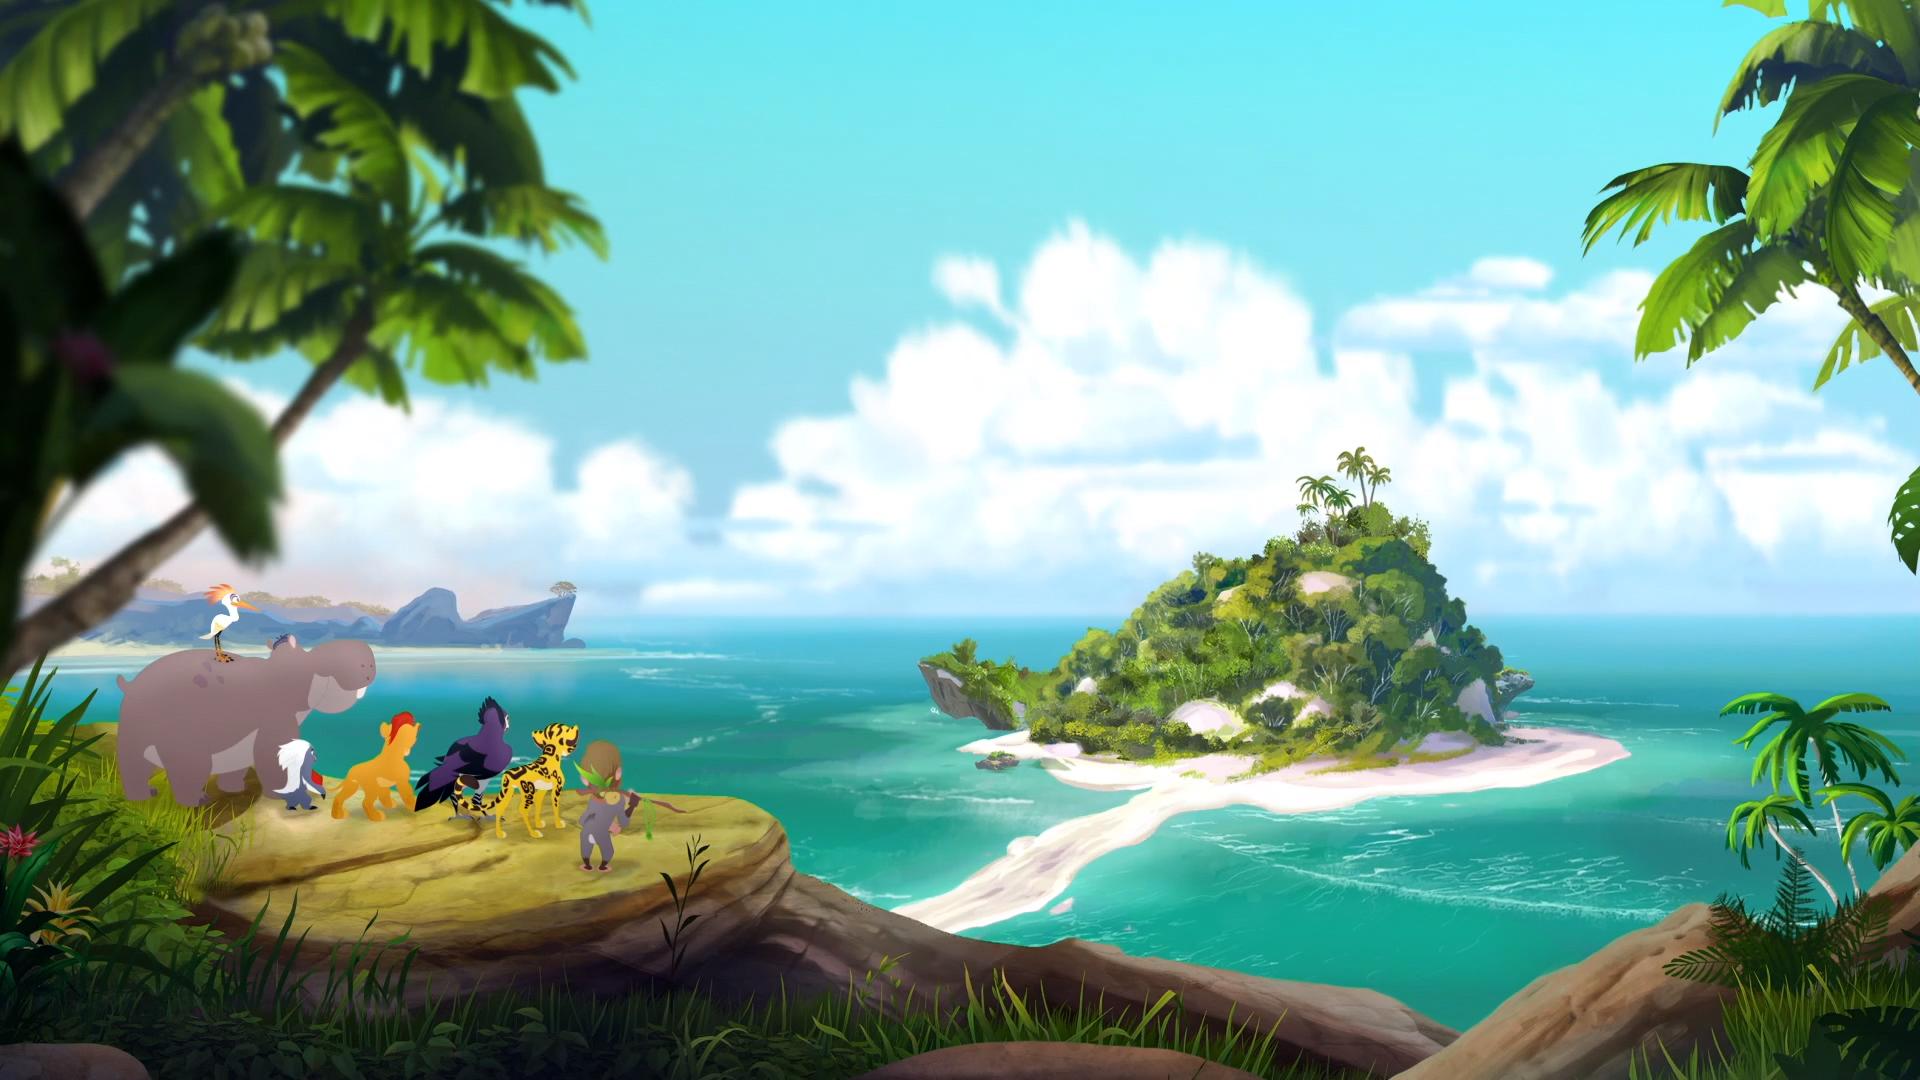 Dragon Island (location)